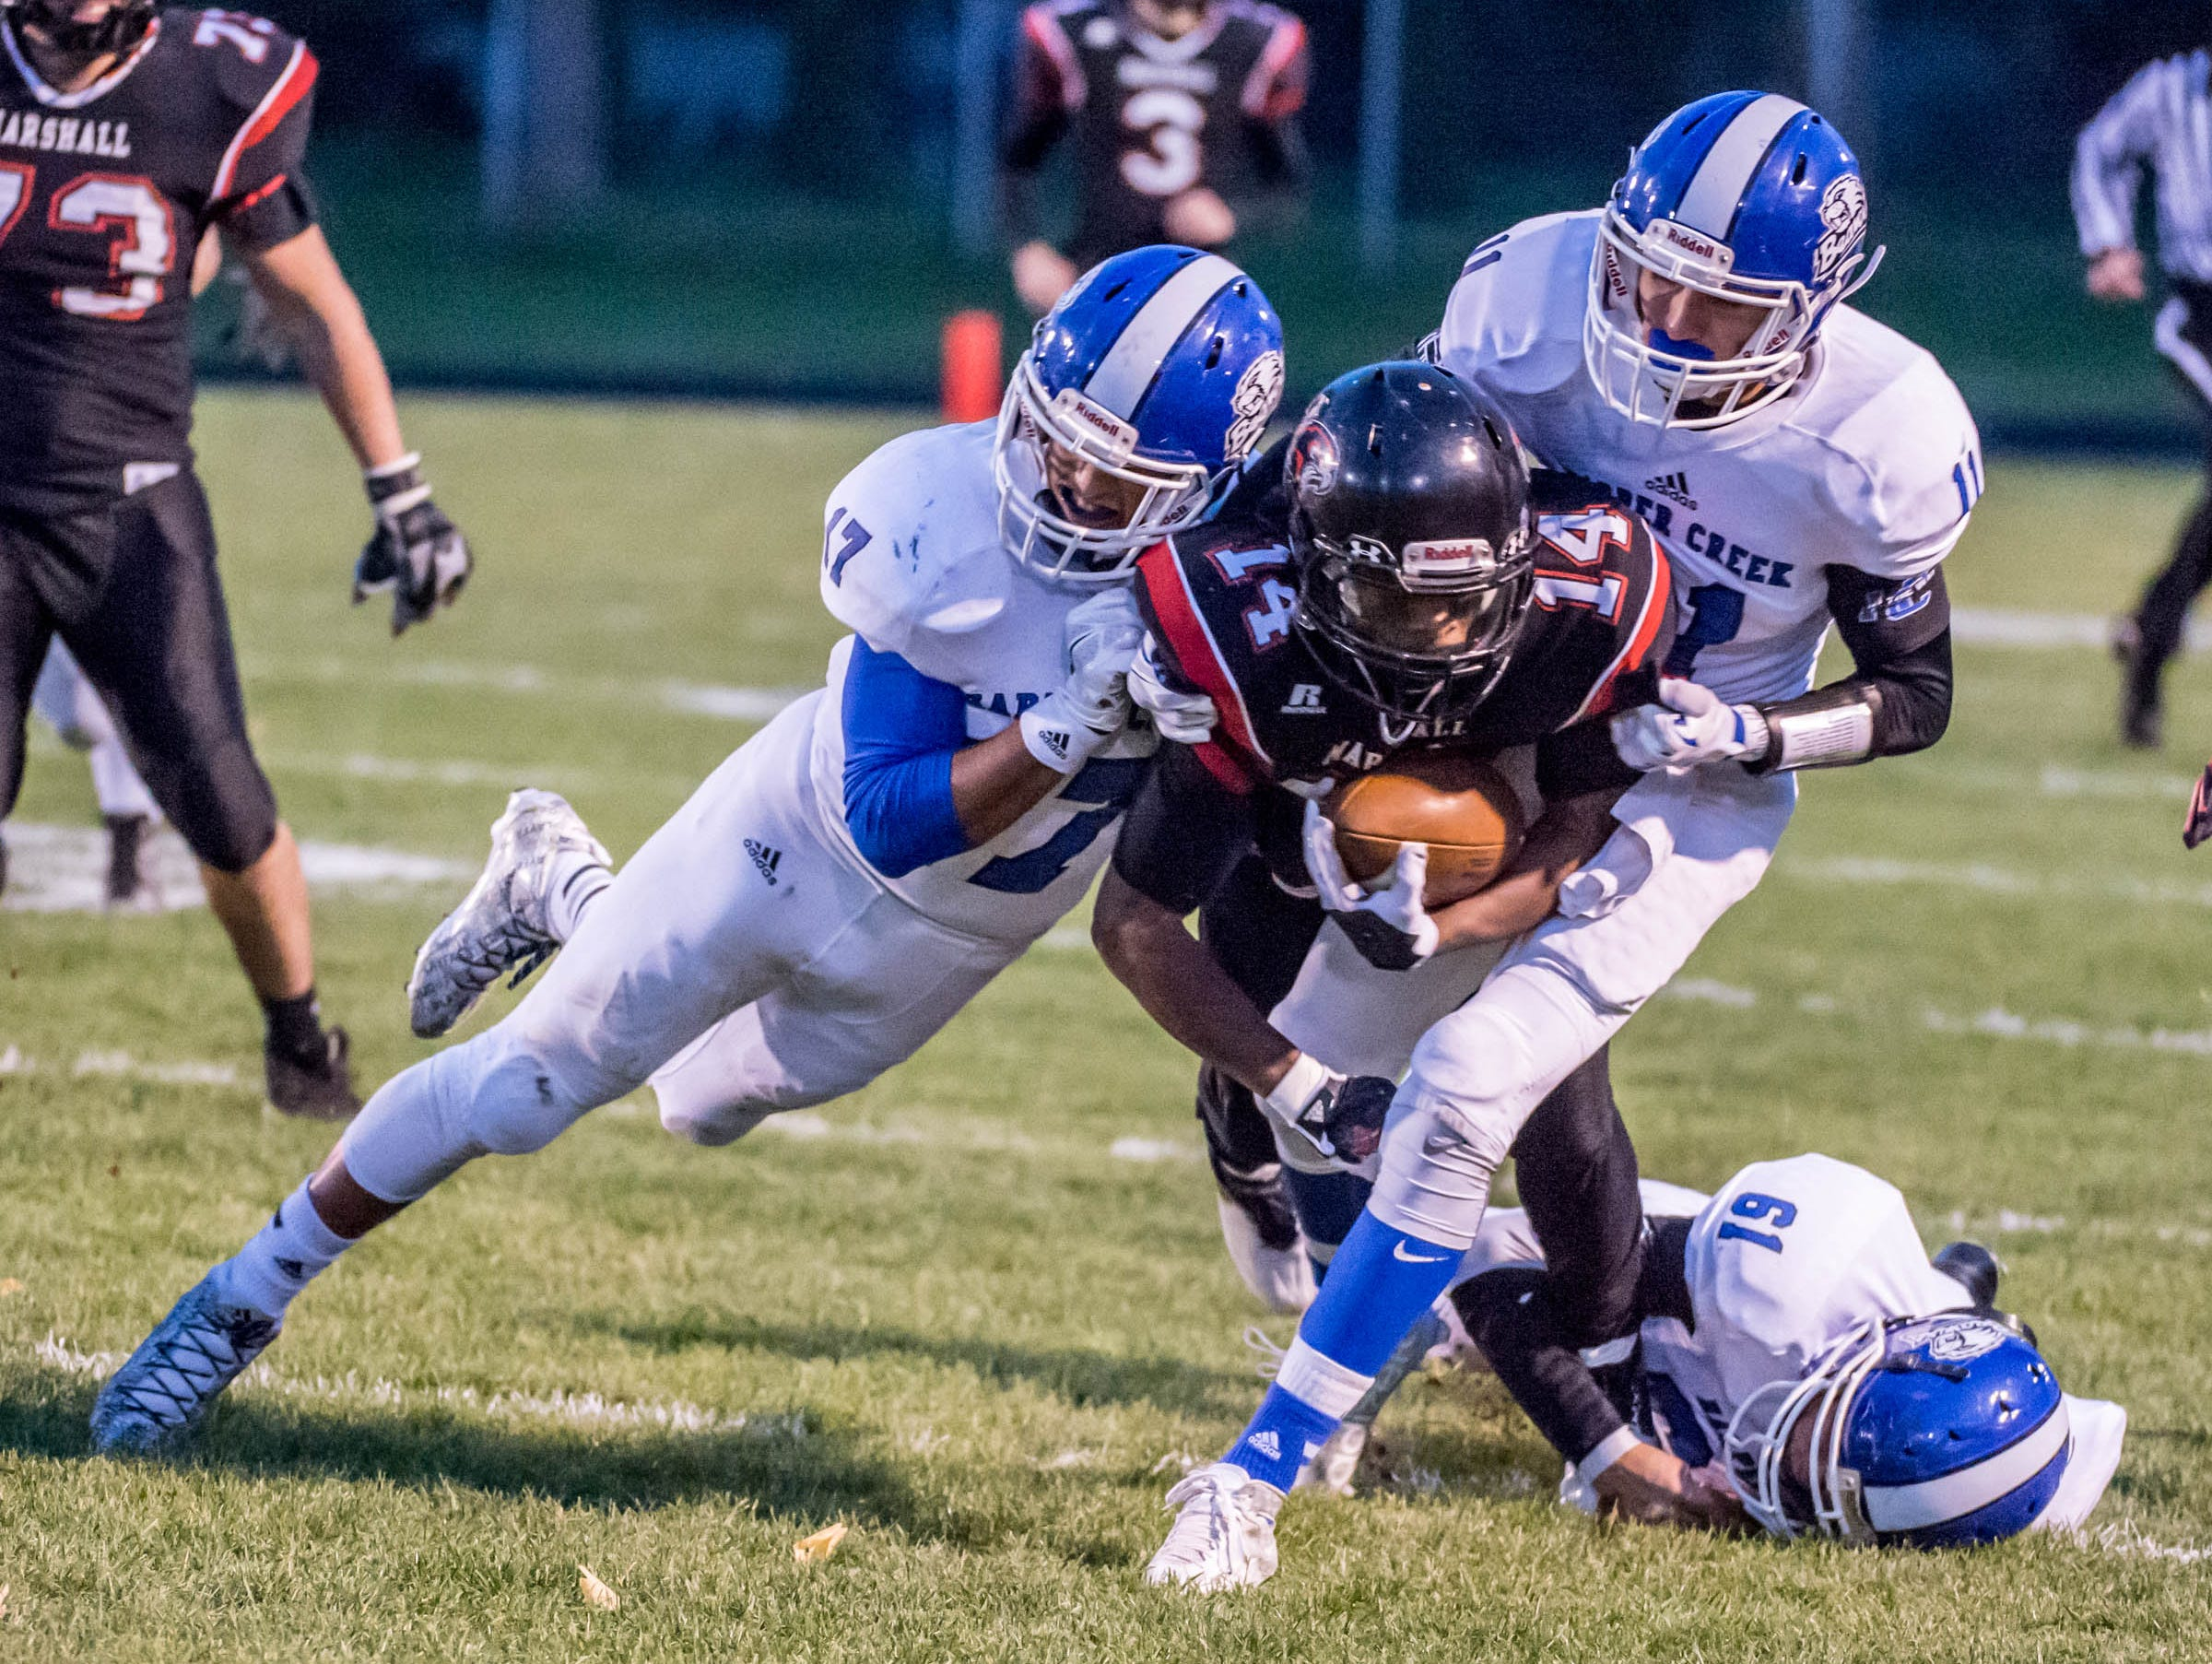 Marshall's Forrest Jackson advances the ball against Harper Creek.